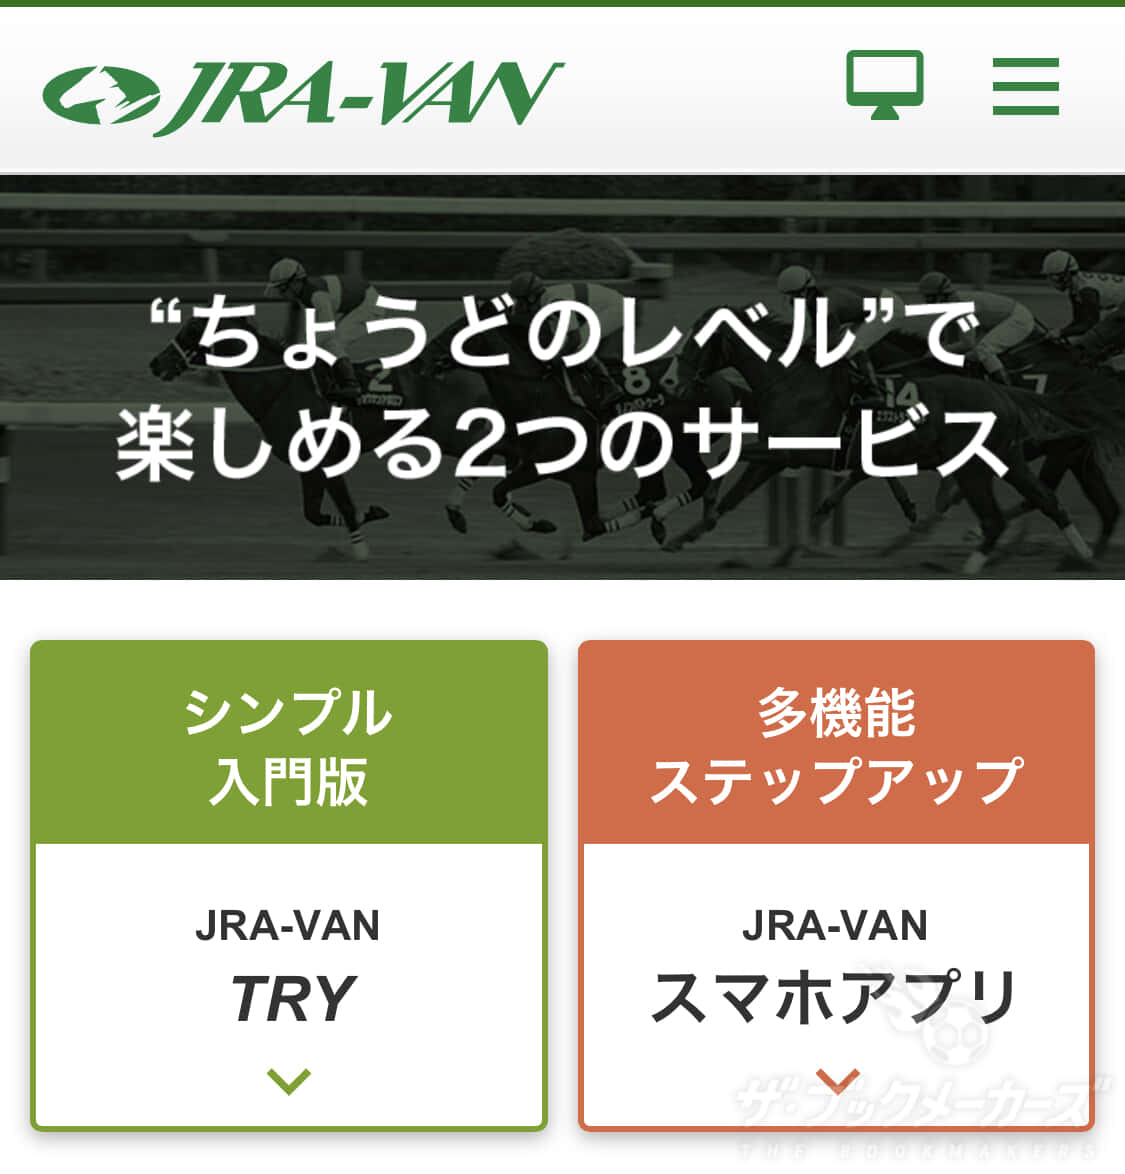 JRAVAN